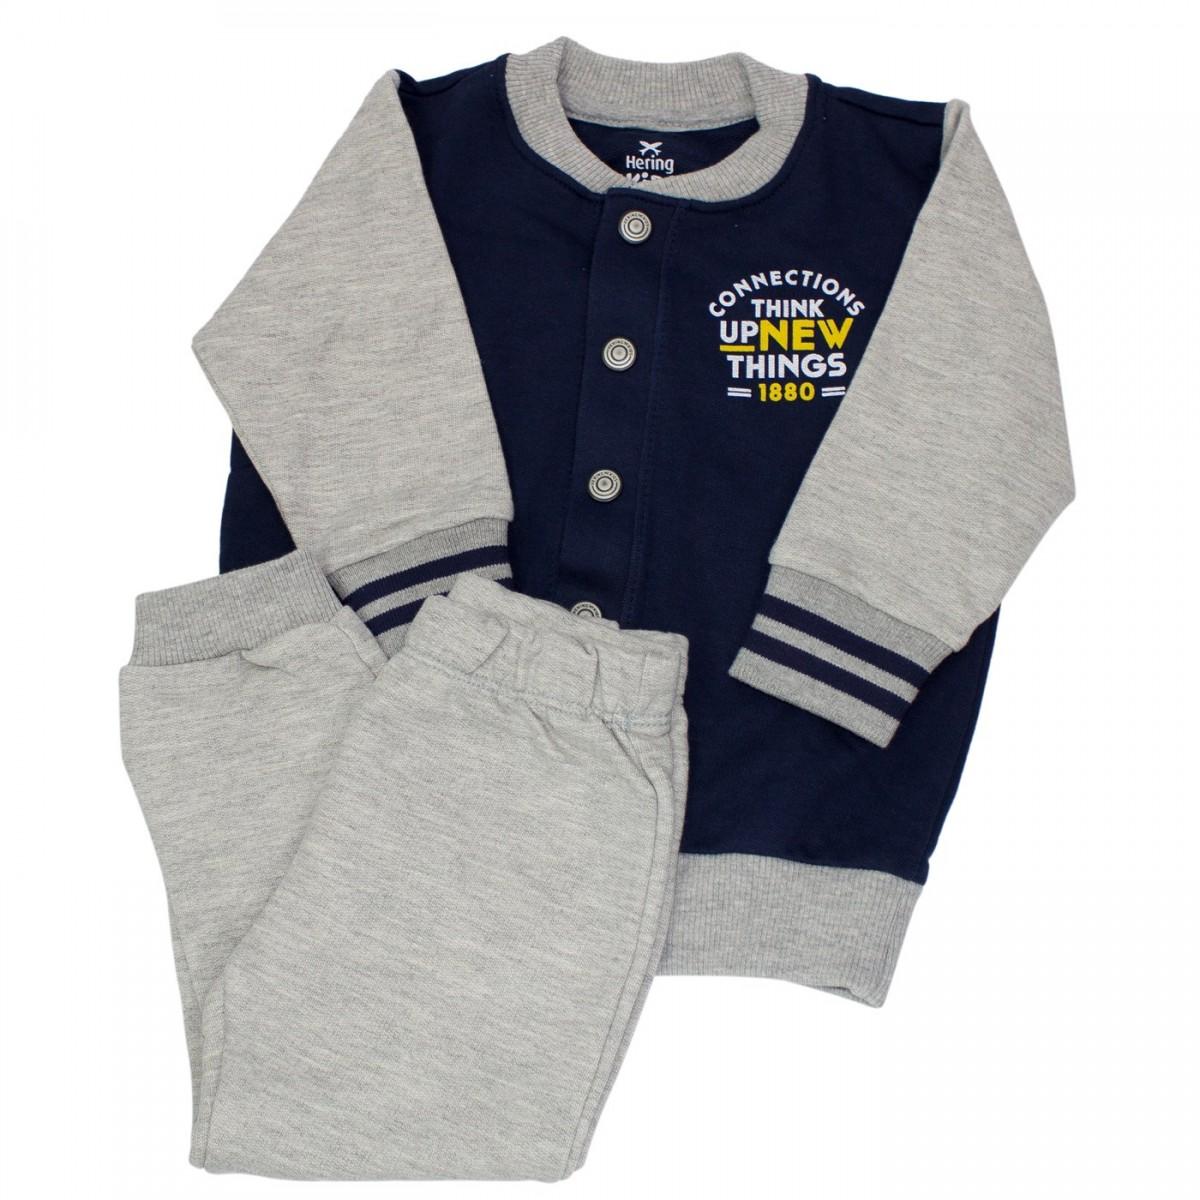 20d9e00ae2dcd Bizz Store - Conjunto Infantil Menino Hering Kids College Moletom